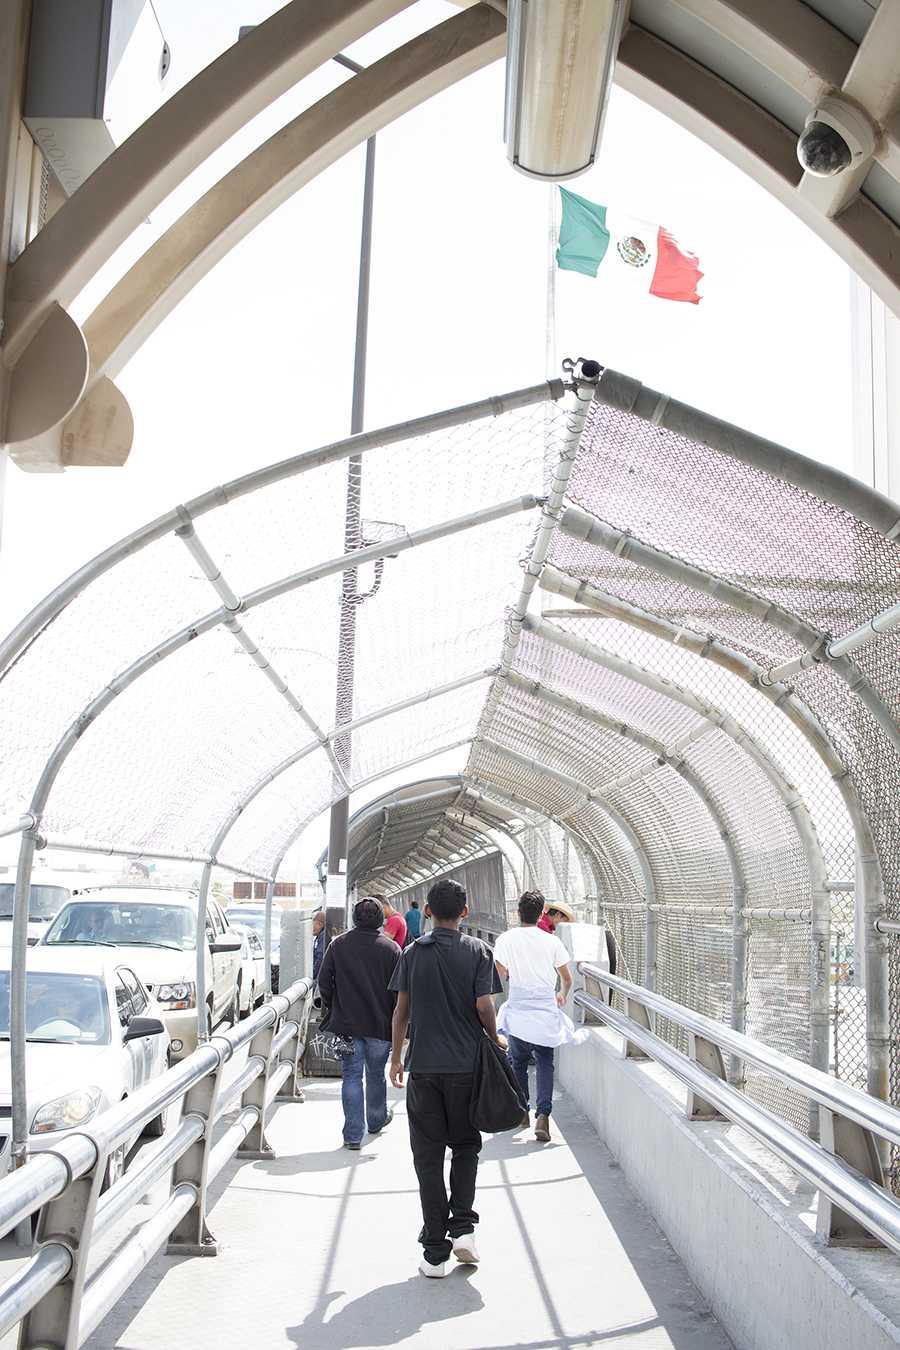 International bridge Paso del Norte's pedestrian bridge.